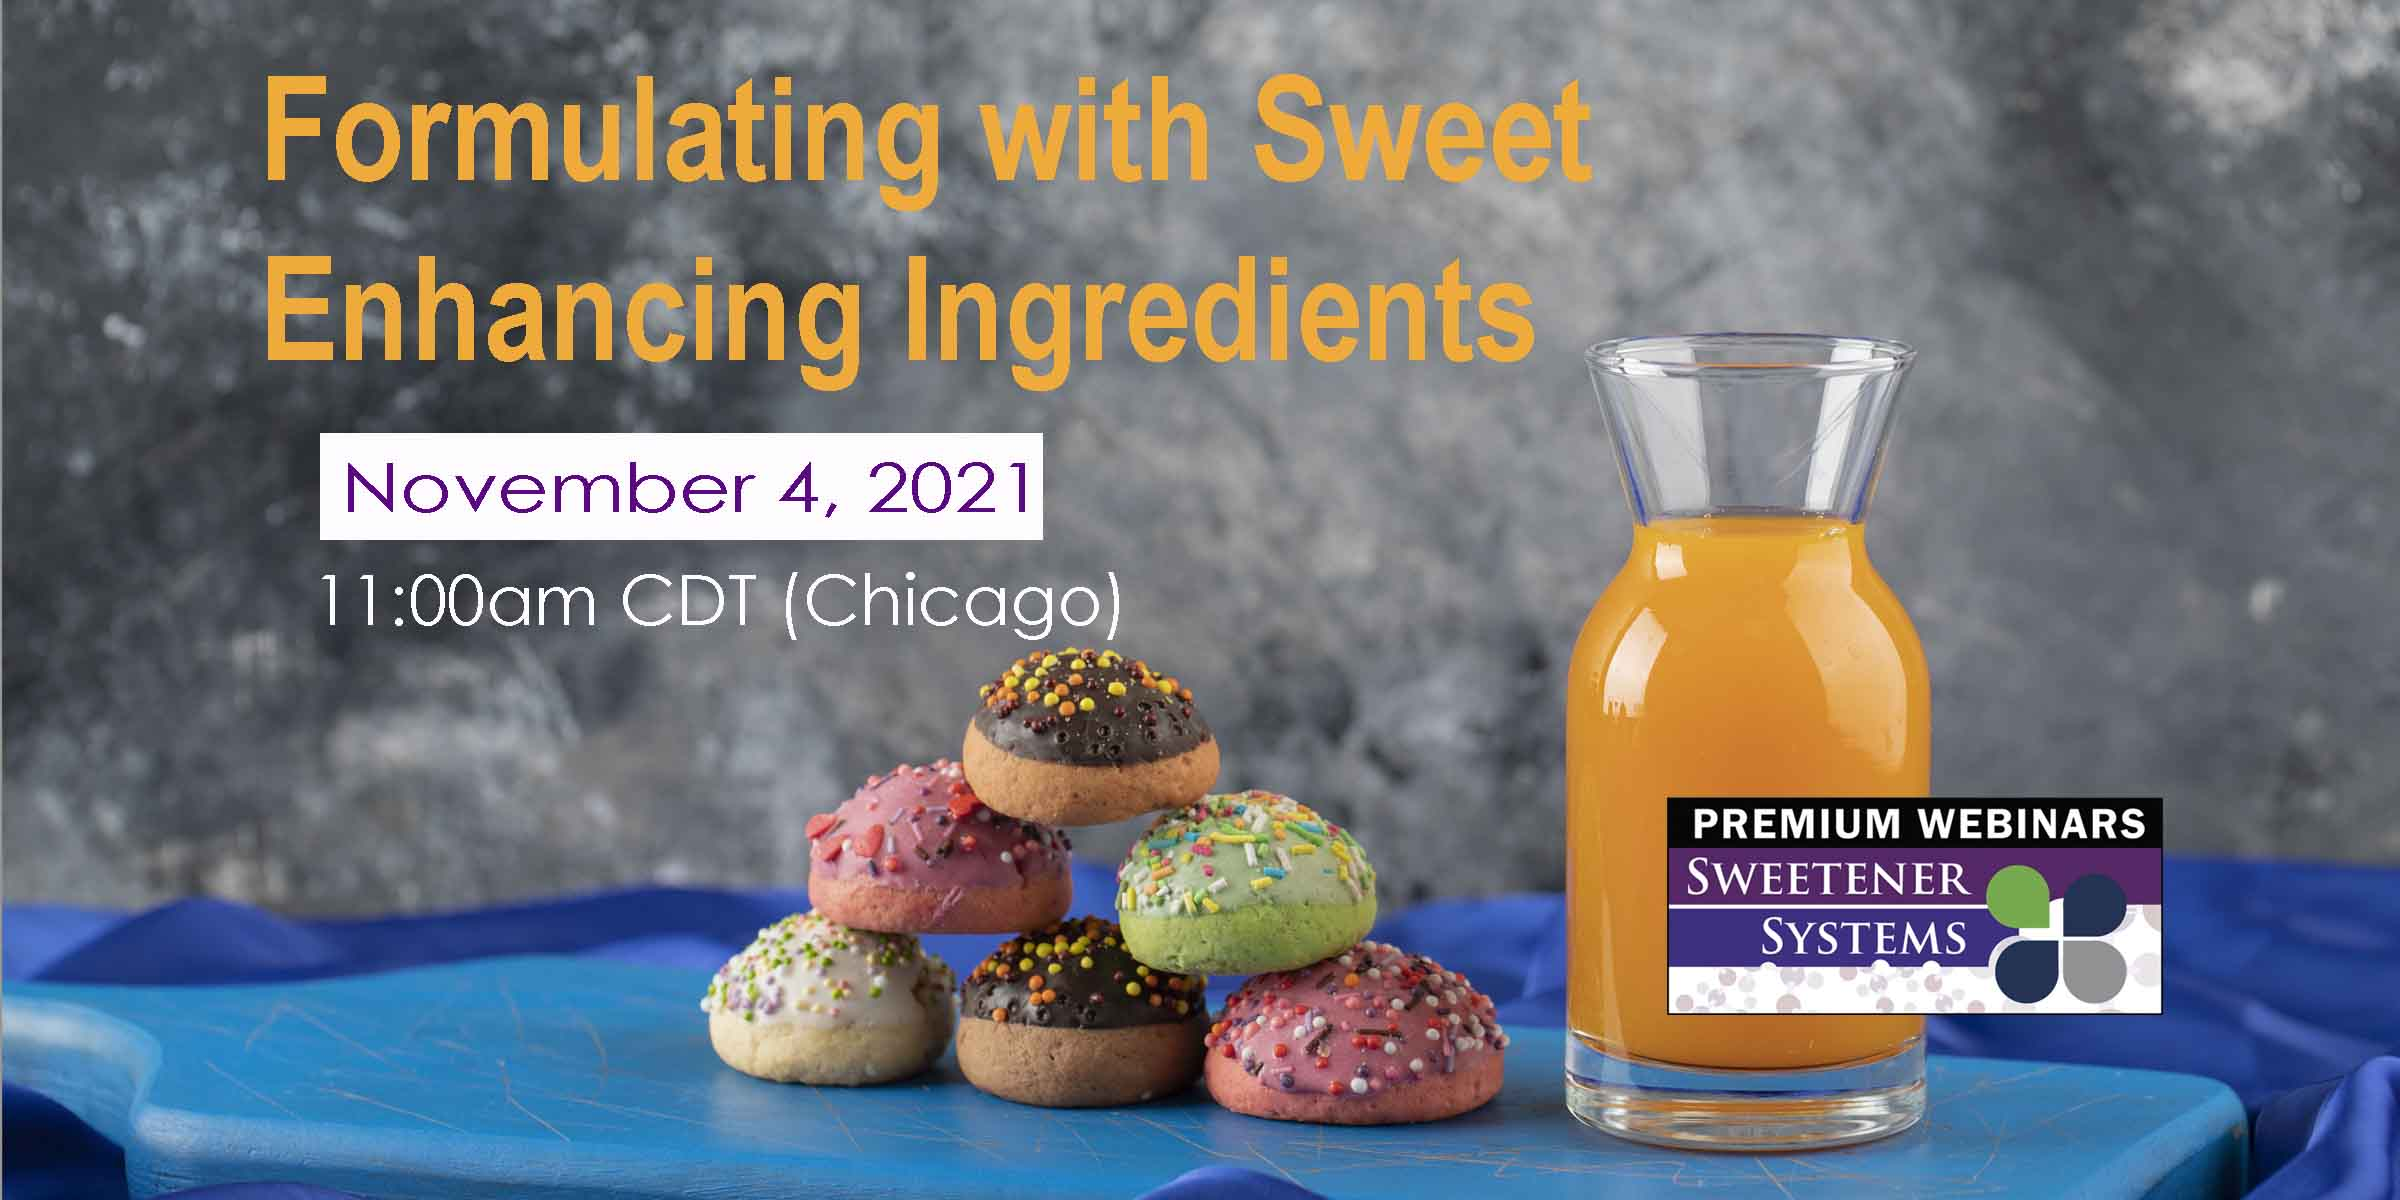 2021 Sweeteners Systems remium Webinar